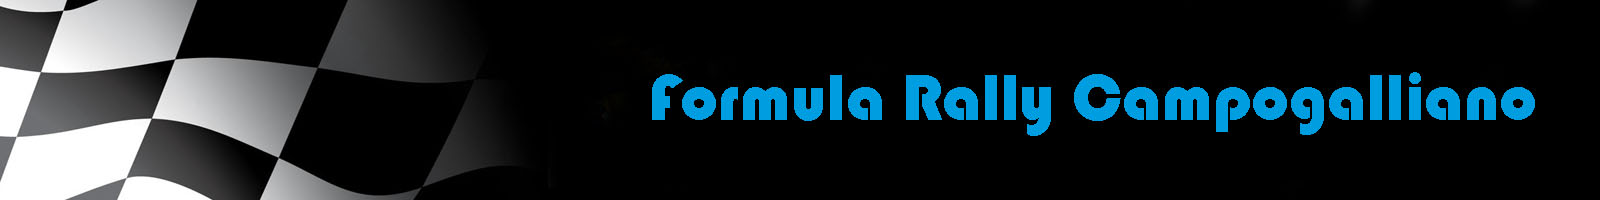 015 Formula Rally Campogalliano